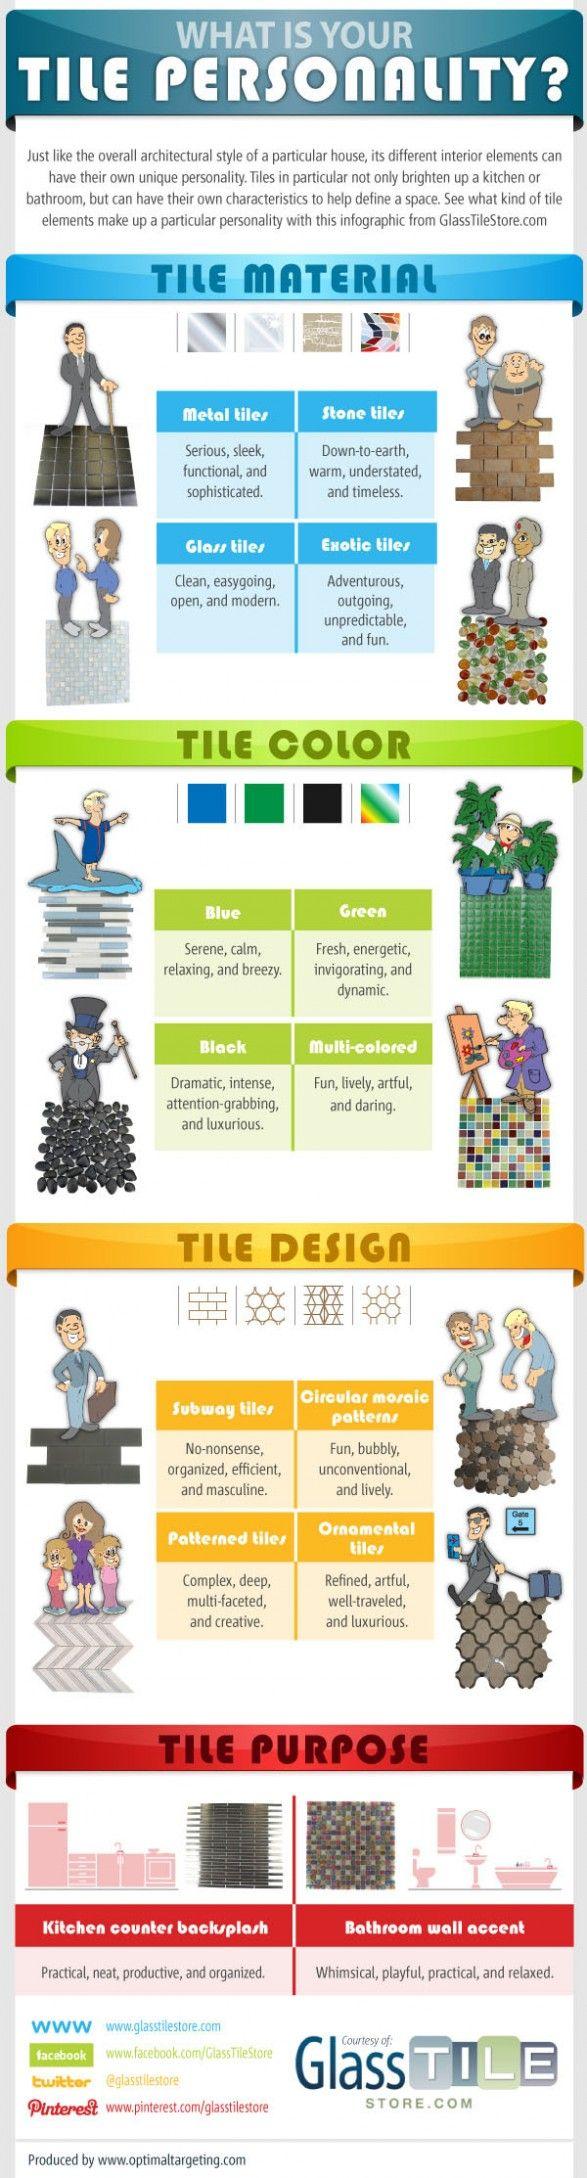 45 Excellent Tile Company Names